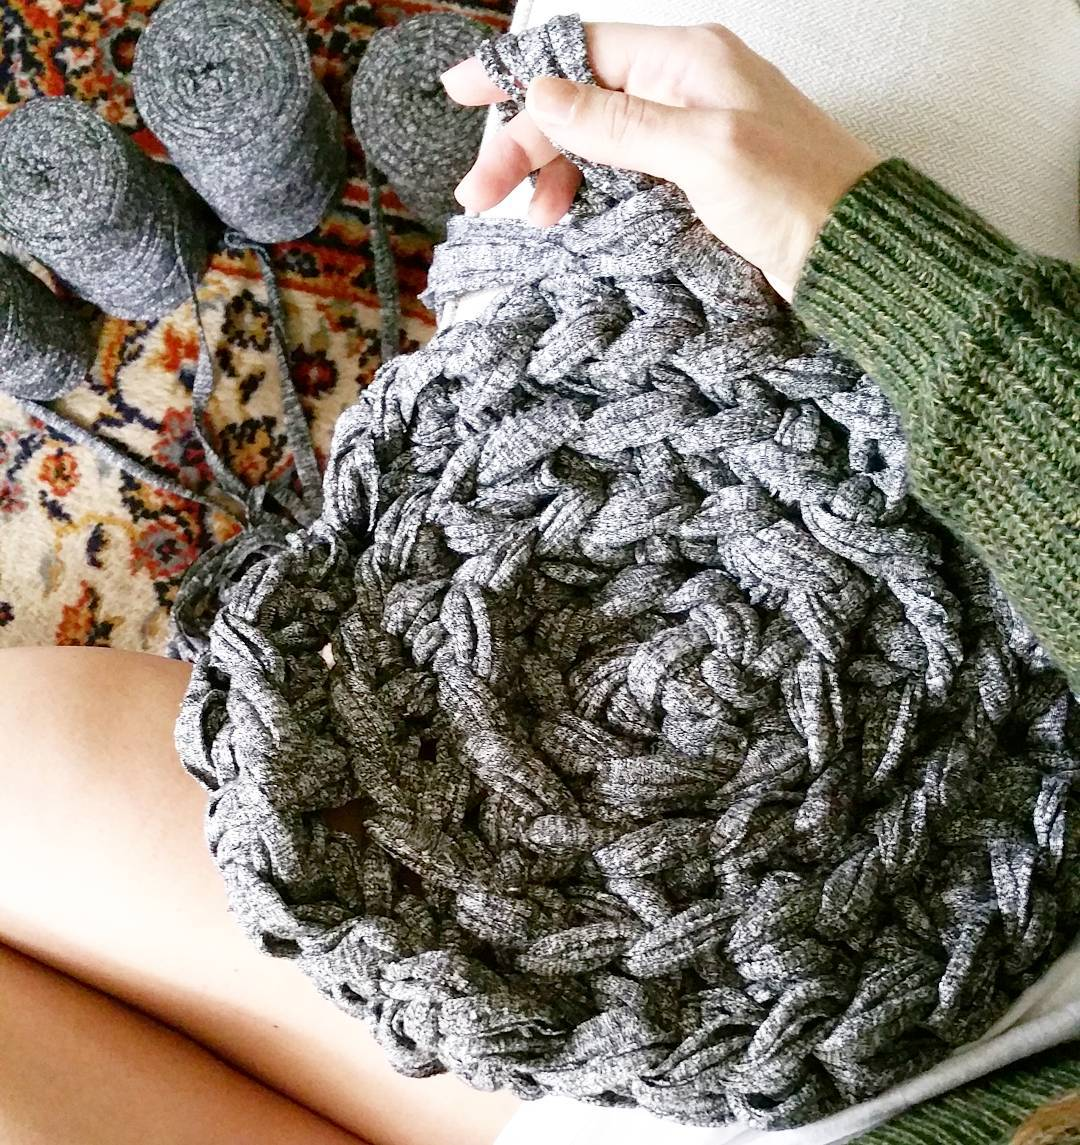 How to Hand Crochet a Circular Rug